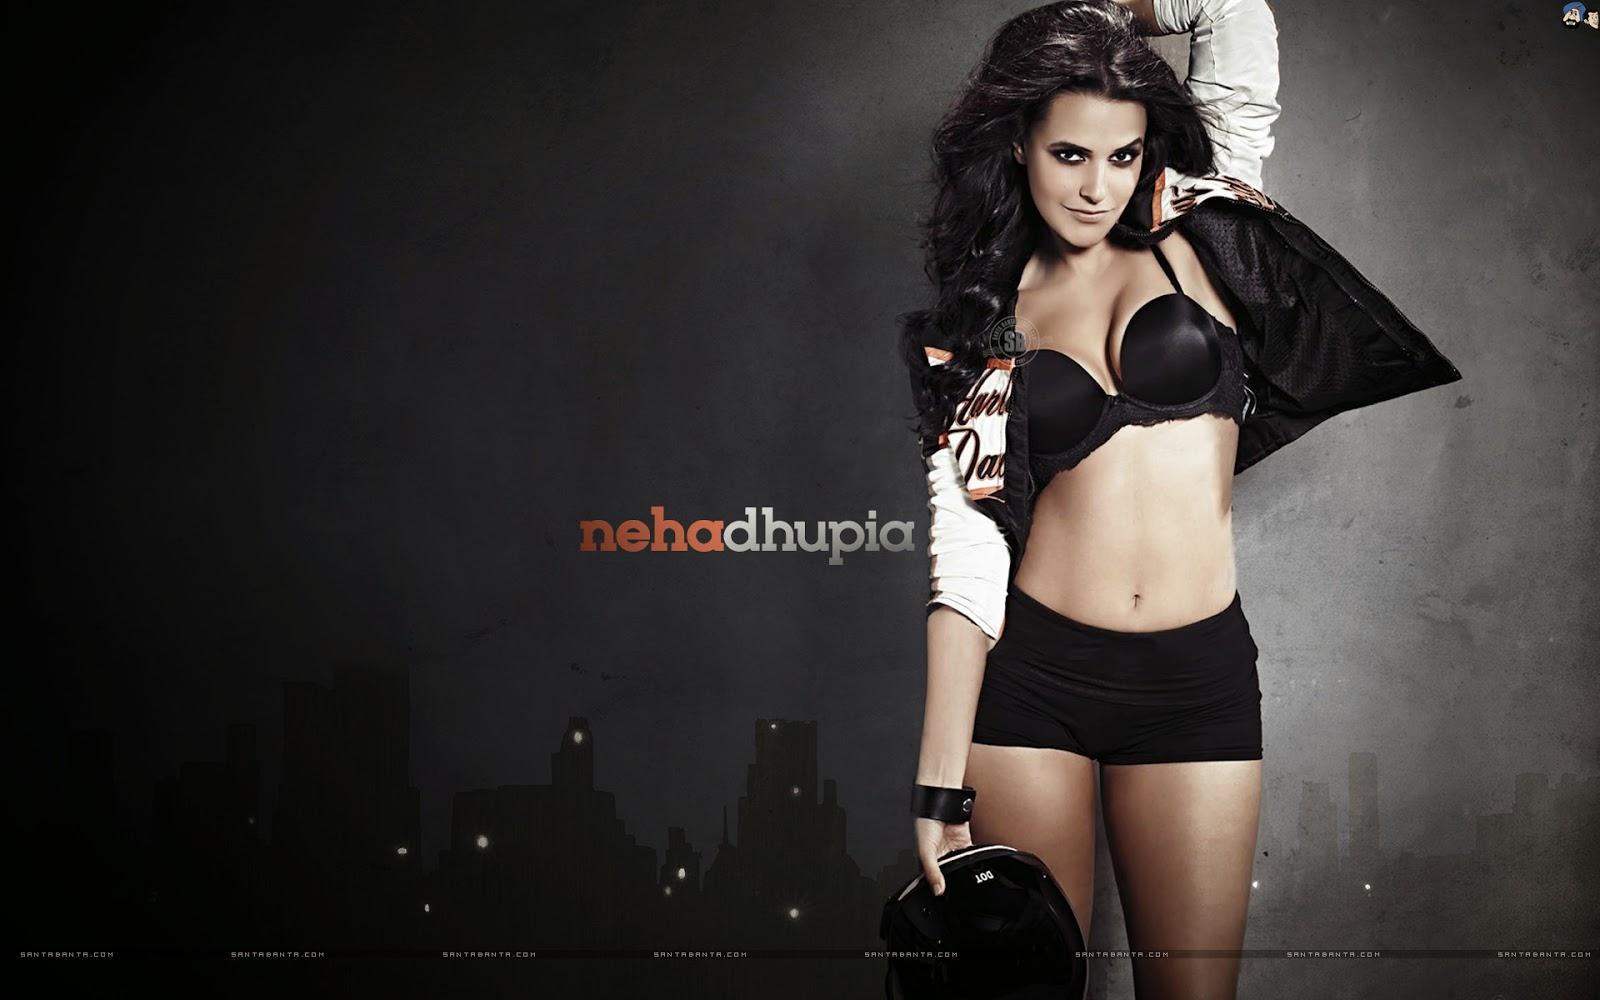 Koleksi Foto Neha Dhupia 14